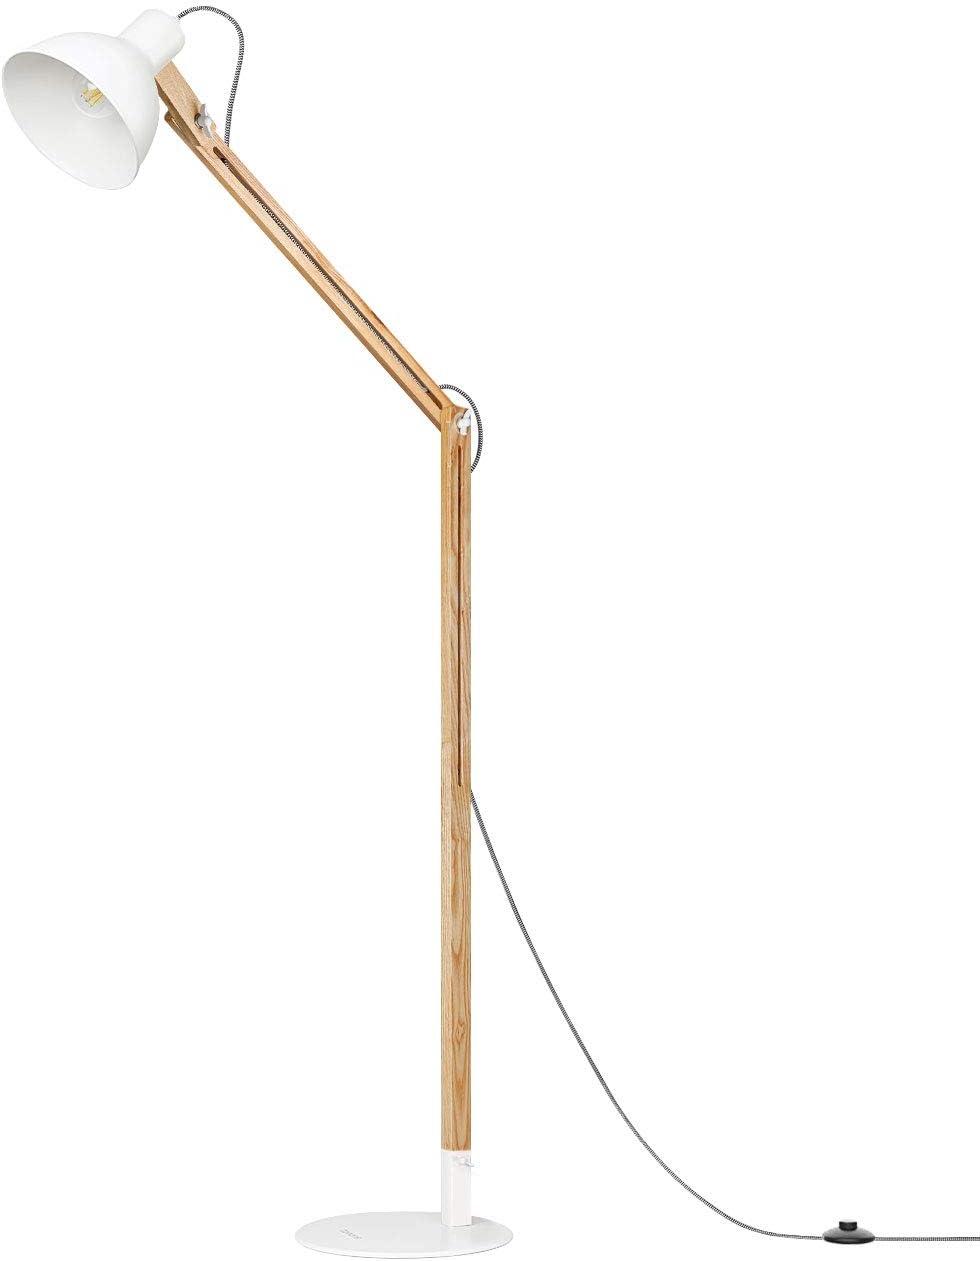 Tomons Stehlampe Holz Led Stehleuchte Moderne Skandinavischer